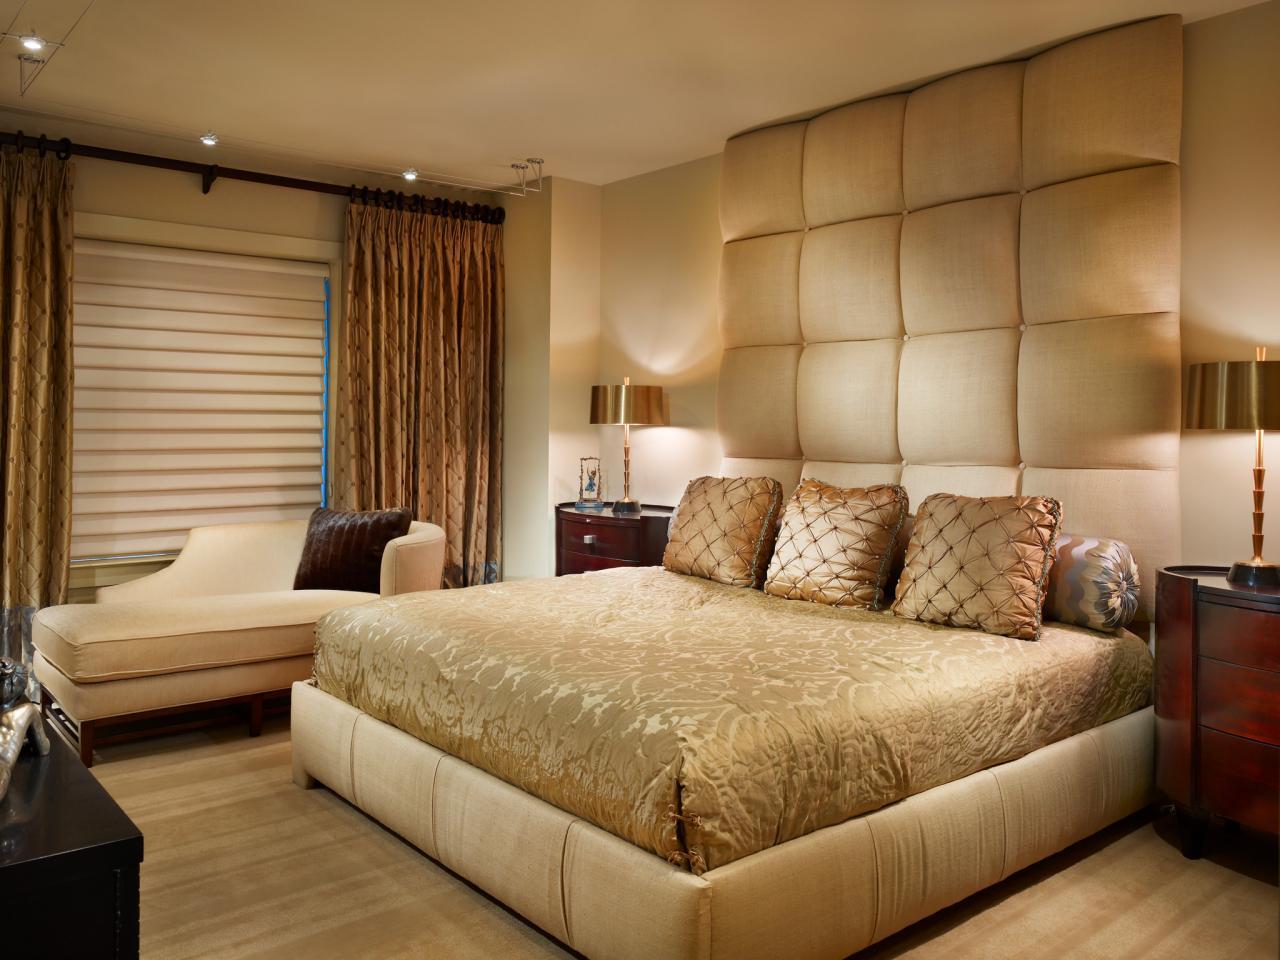 Elegant Master Bedroom Paint Color Ideas master bedroom color ideas